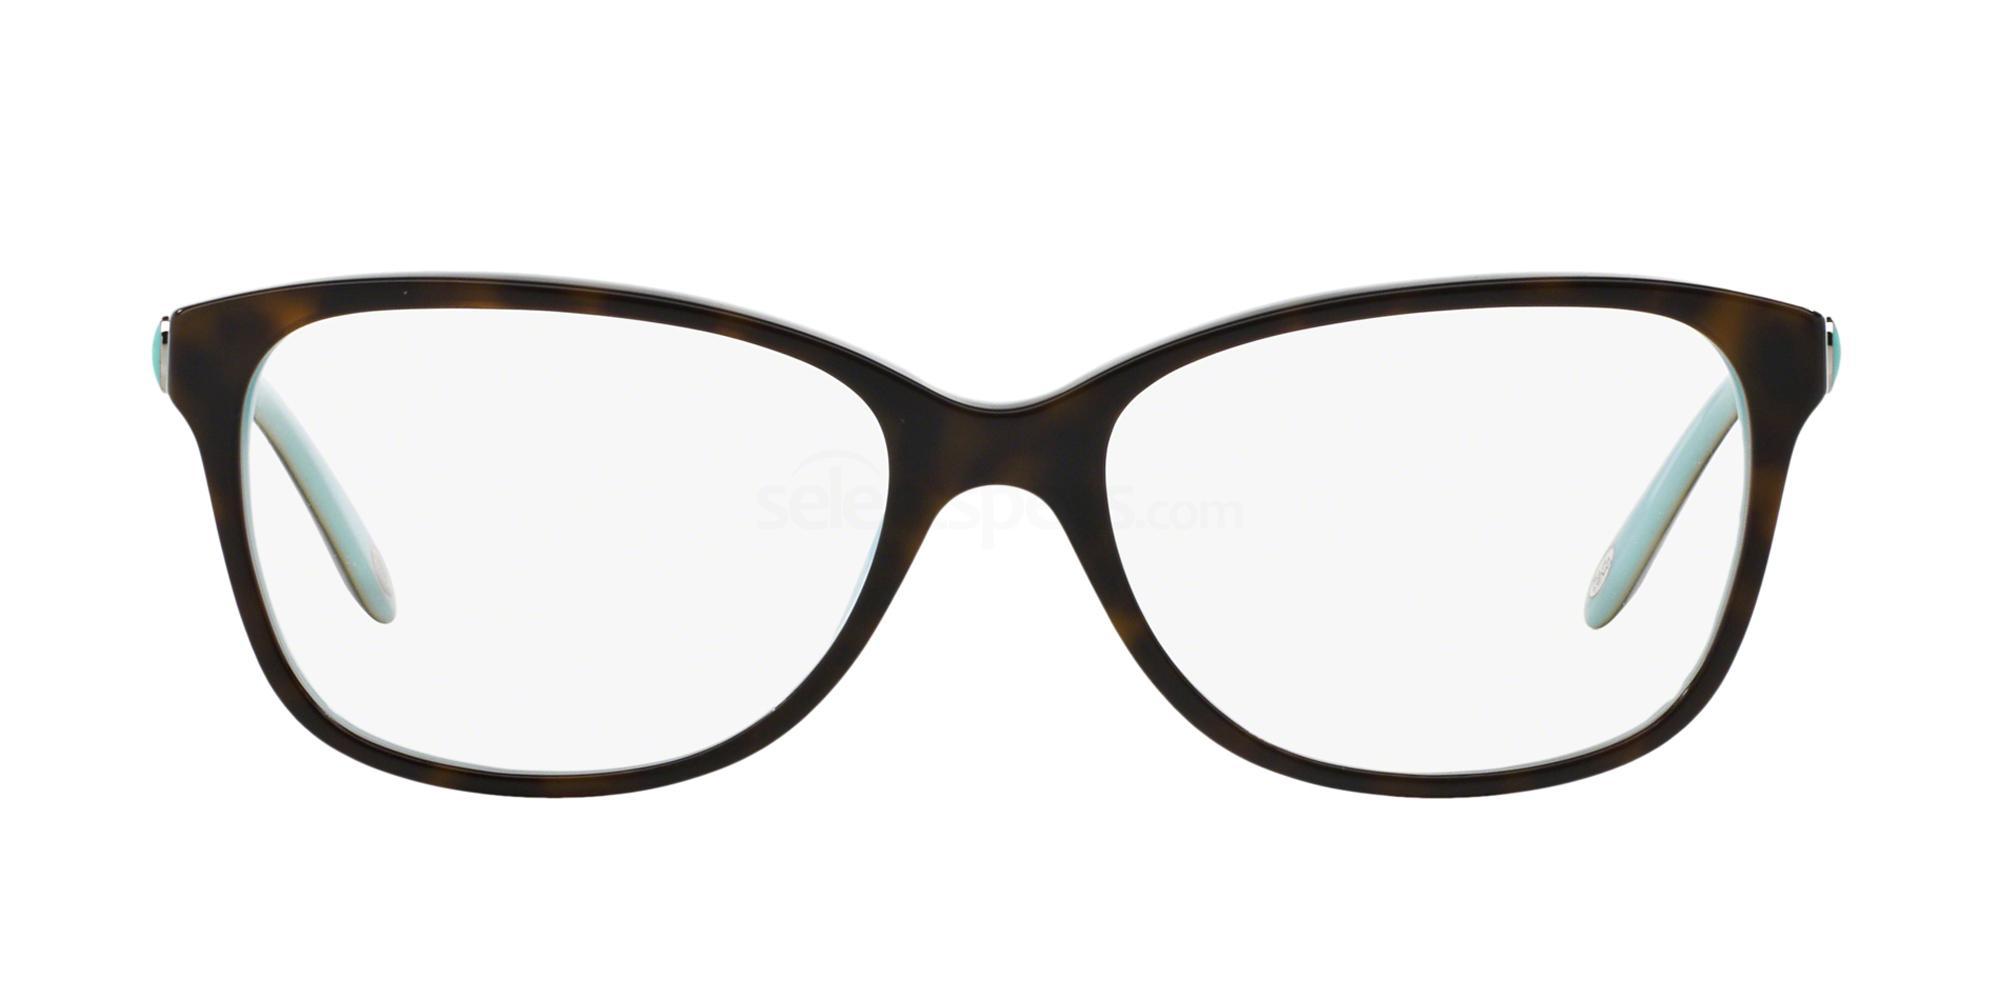 8134 TF2097 Glasses, Tiffany & Co.